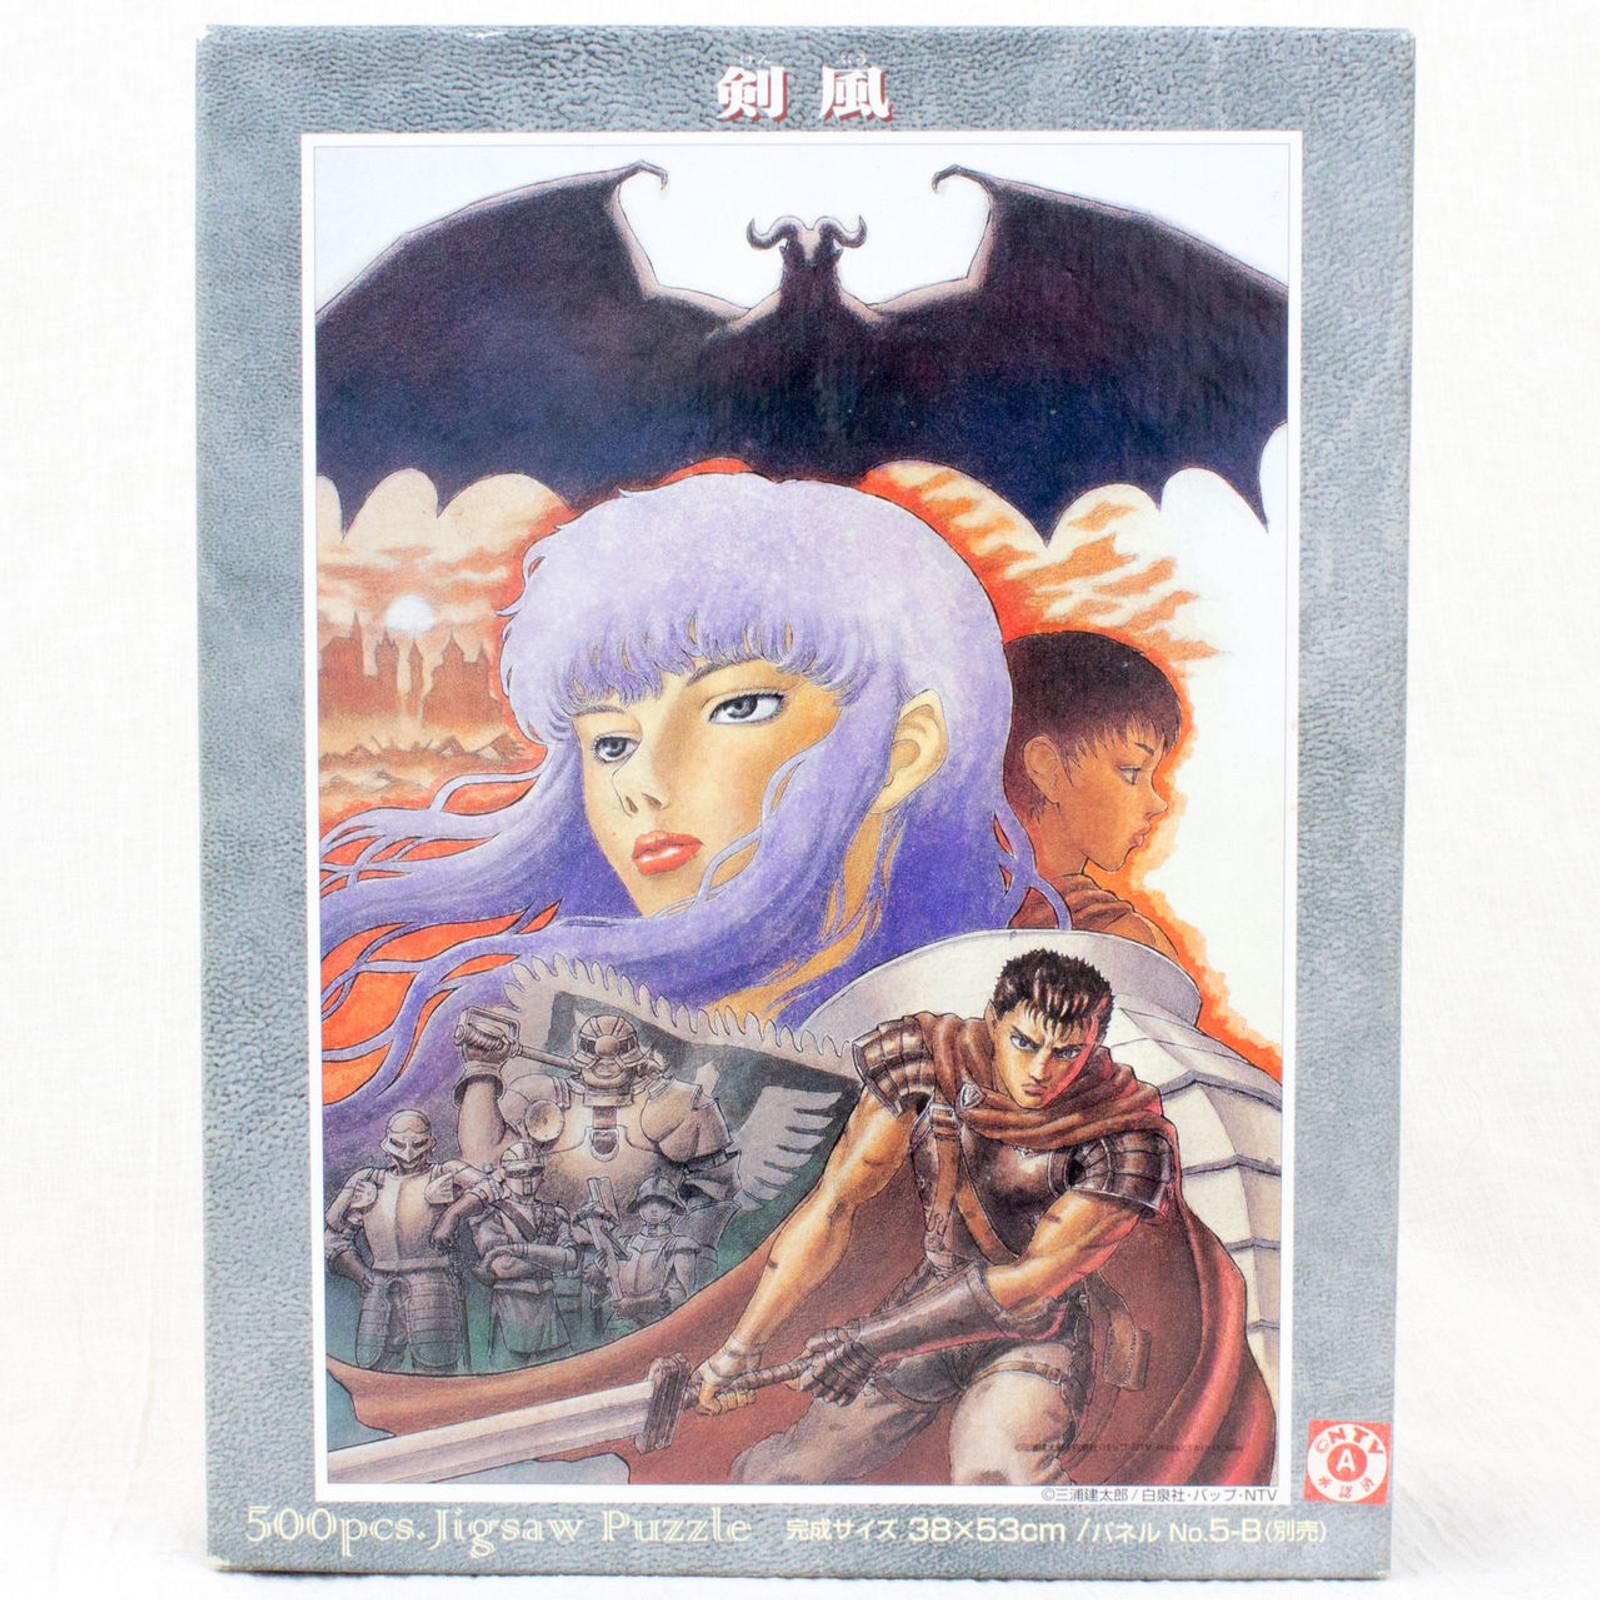 Berserk Guts Griffith Jigsaw Puzzle 500pcs 38Ã_8cm JAPAN ANIME MANGA